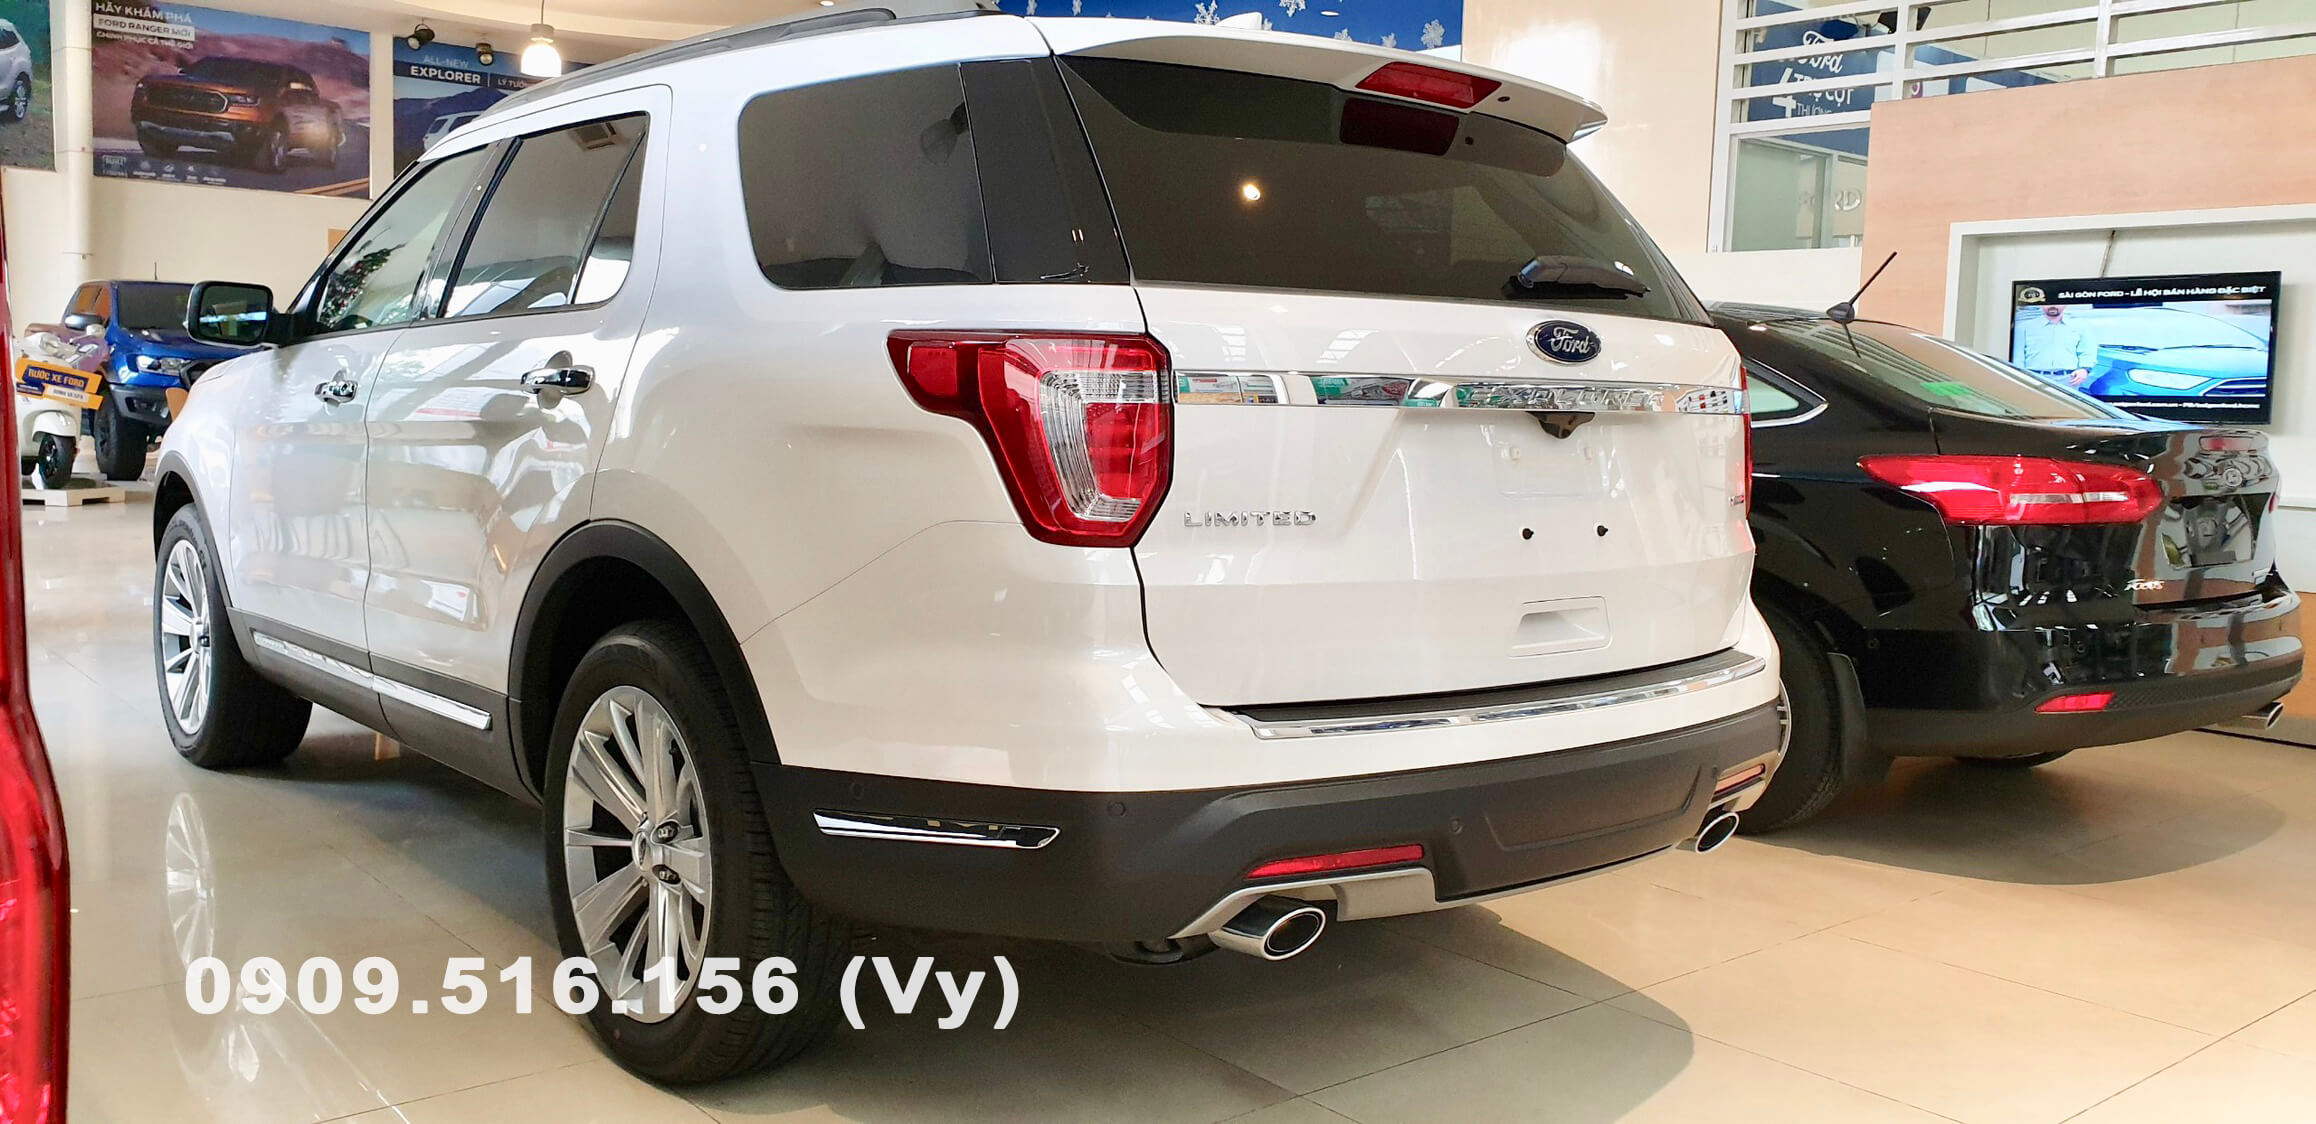 duoi-xe-ford-explorer-2019-muaxegiatot-vn